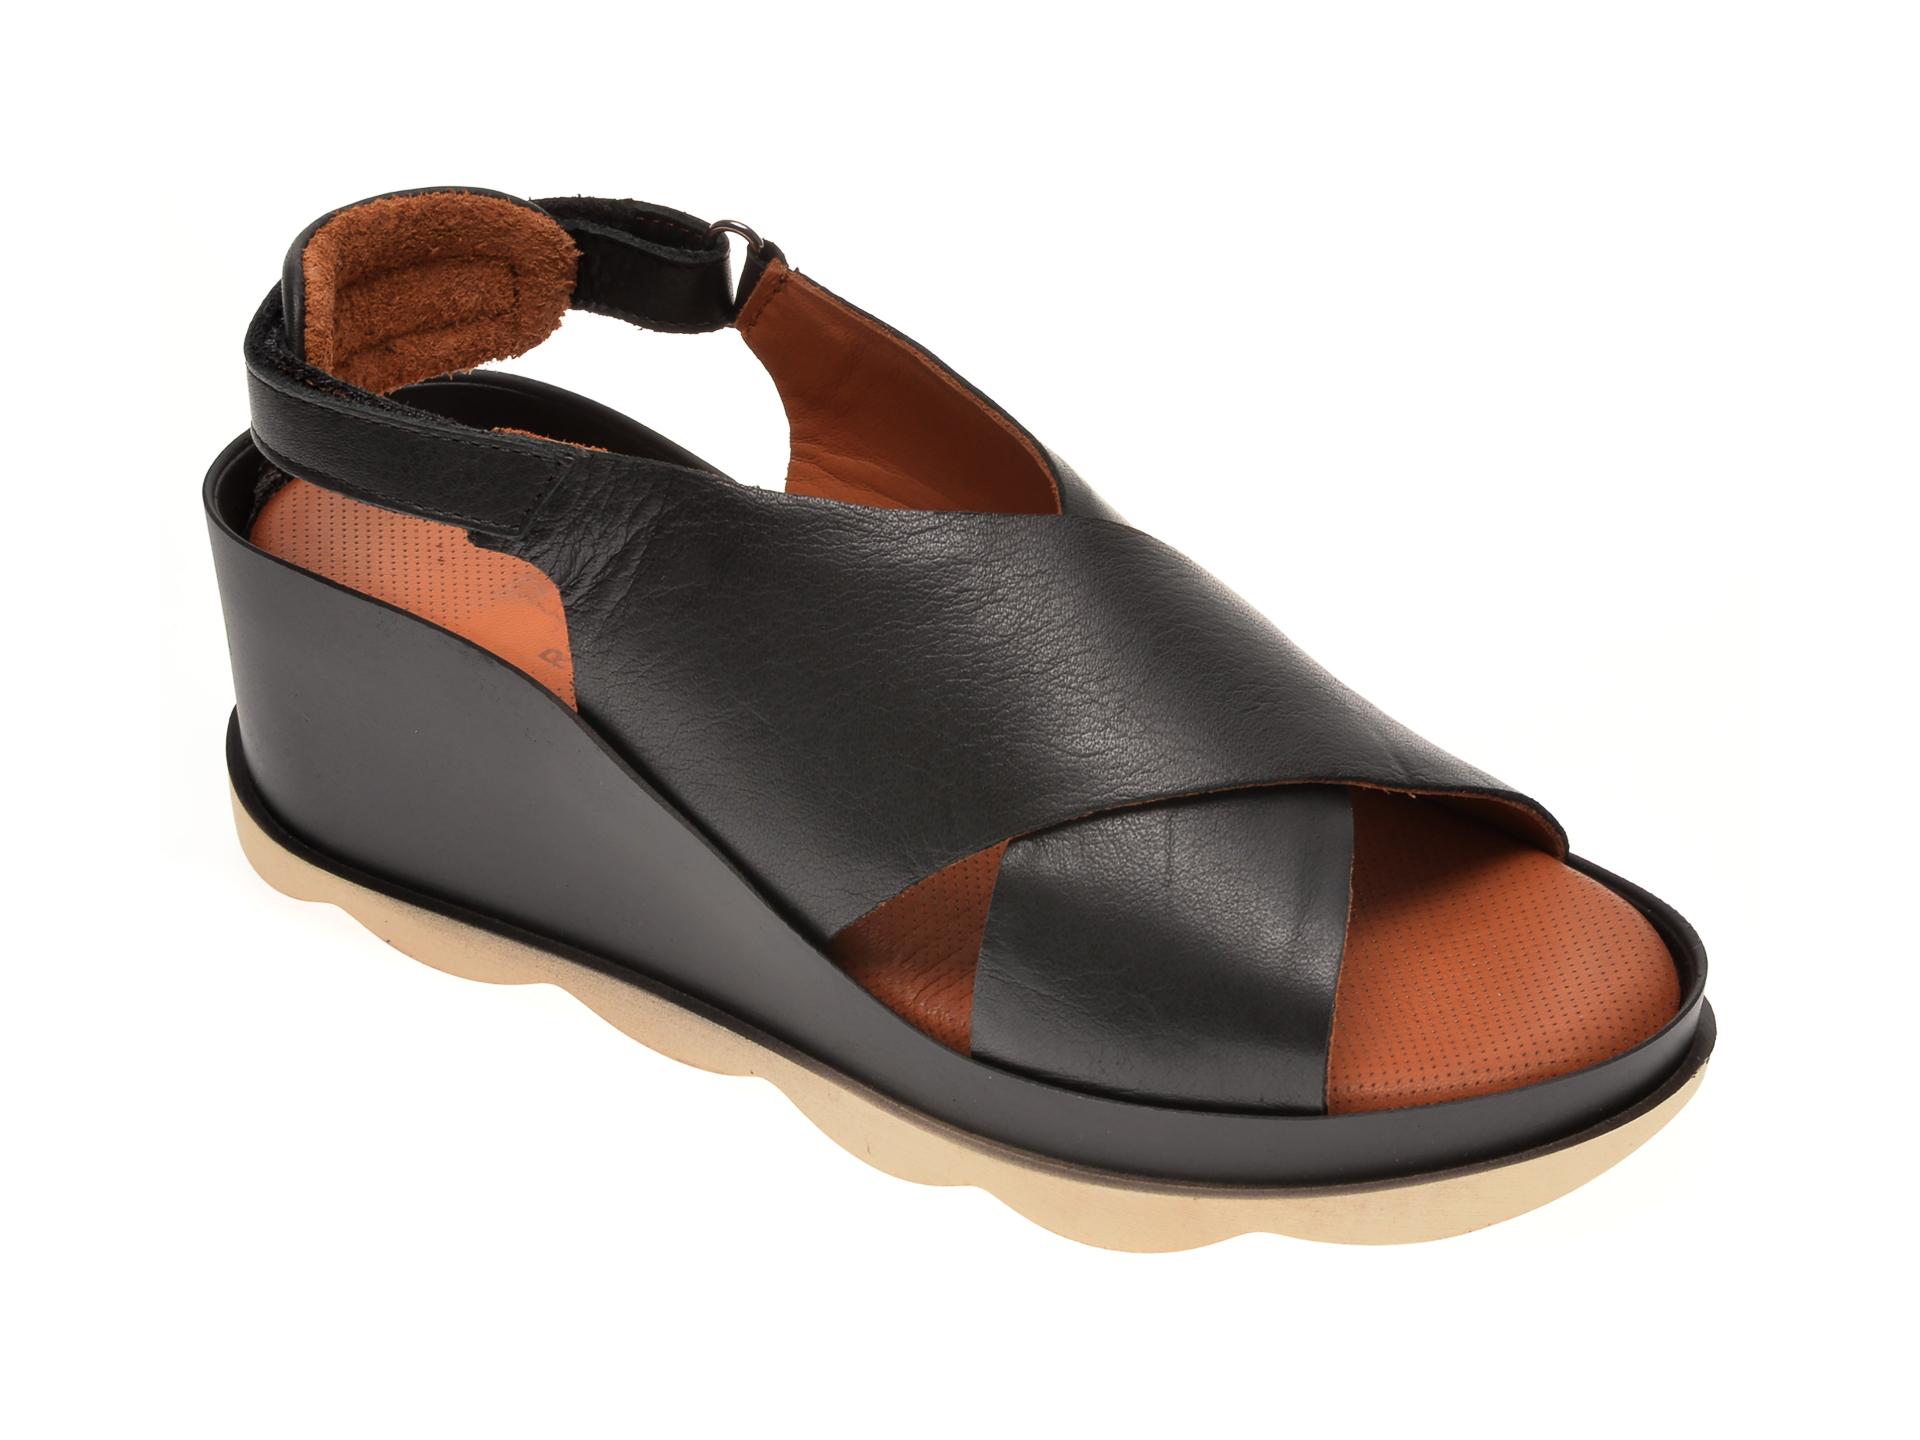 Sandale BABOOS negre, 0506, din piele naturala imagine